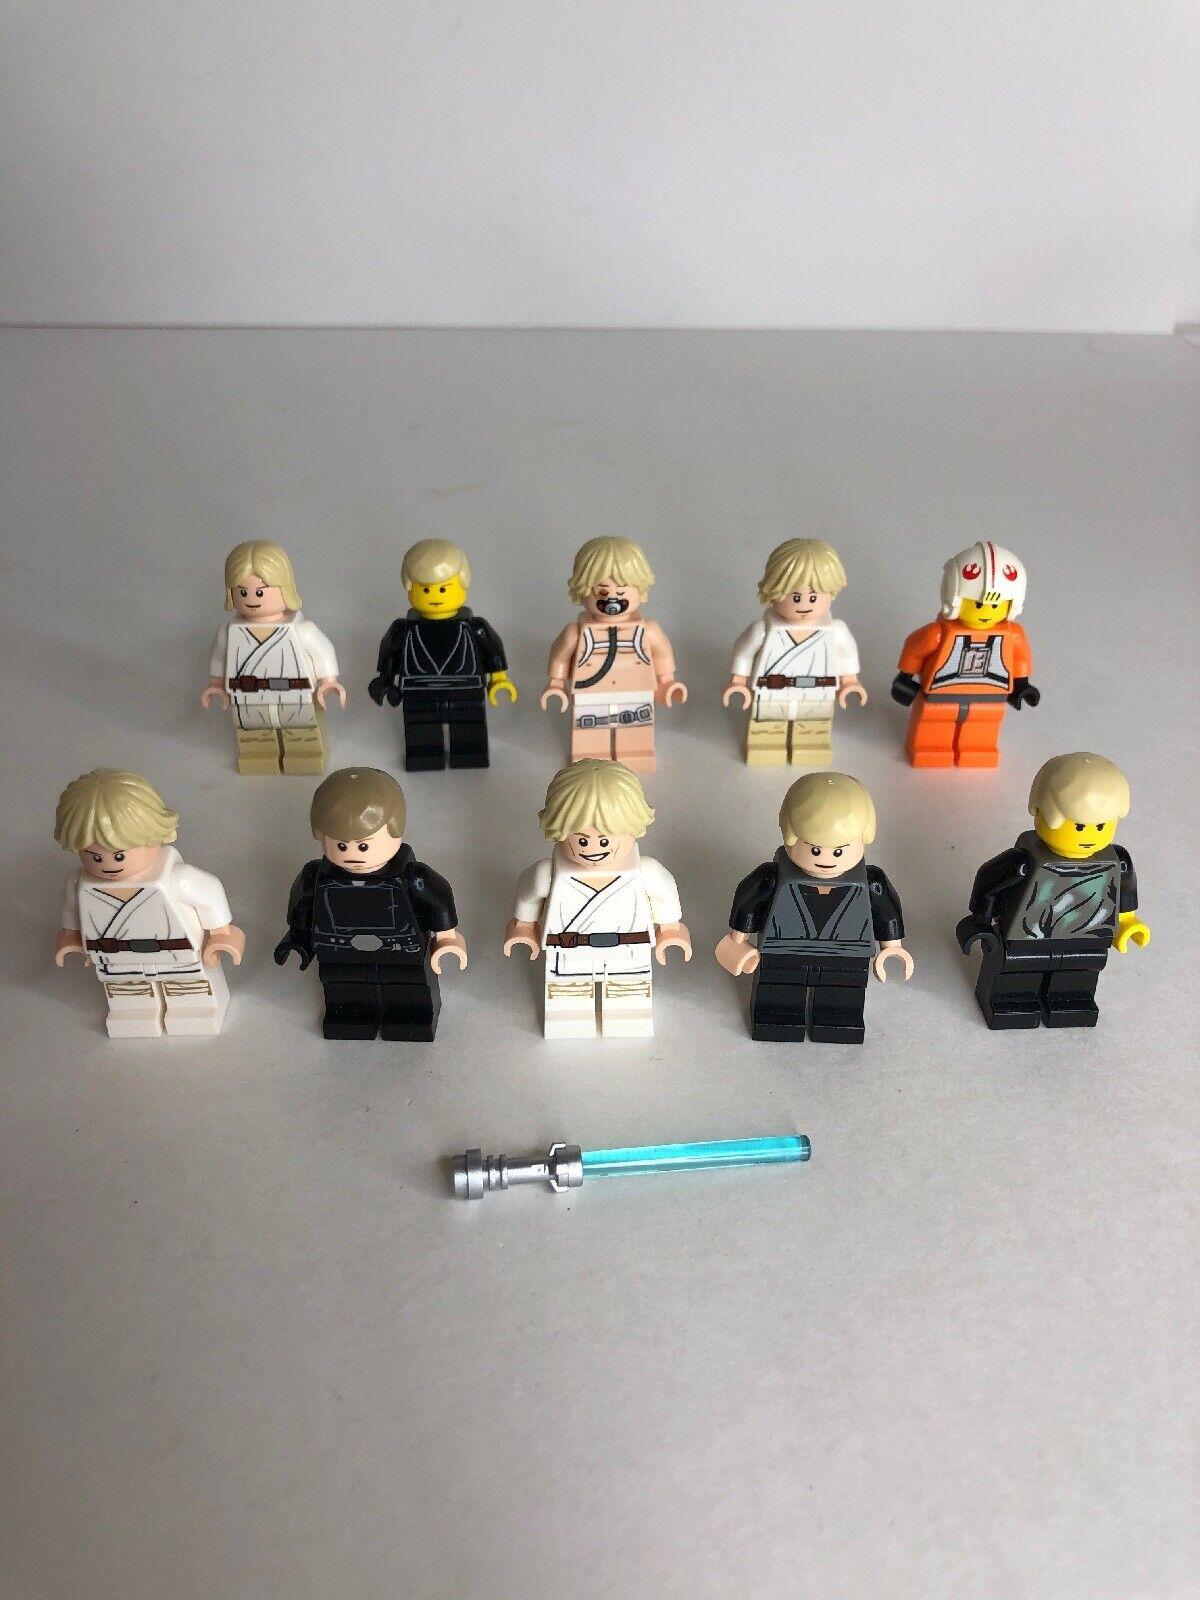 Lego Star Wars 10 MINIFIGUREs Luke Skywalker Lot 7128 Pilot 75059 75005 X2